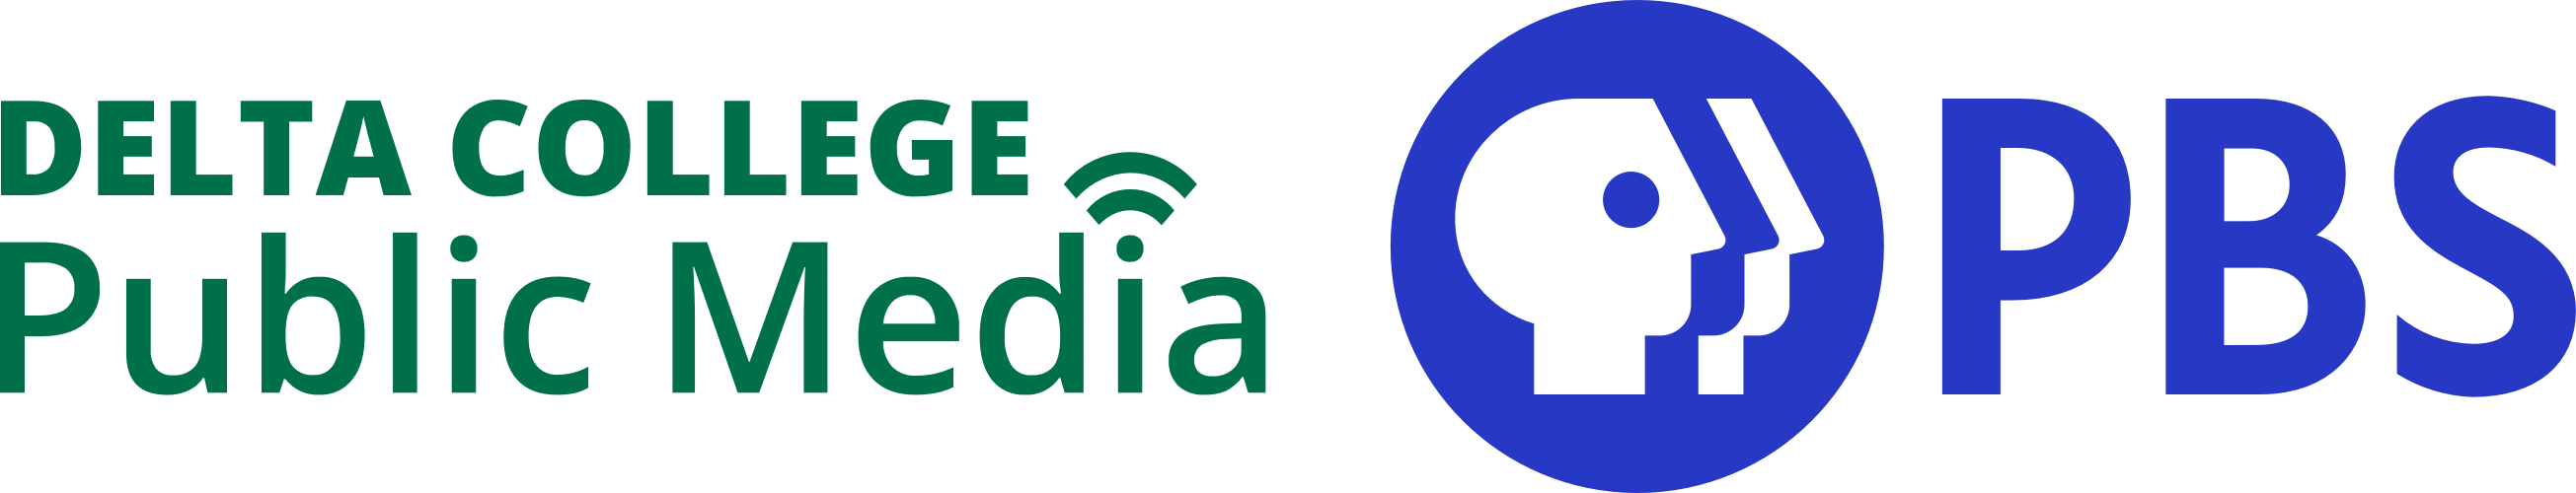 Delta College Public Media